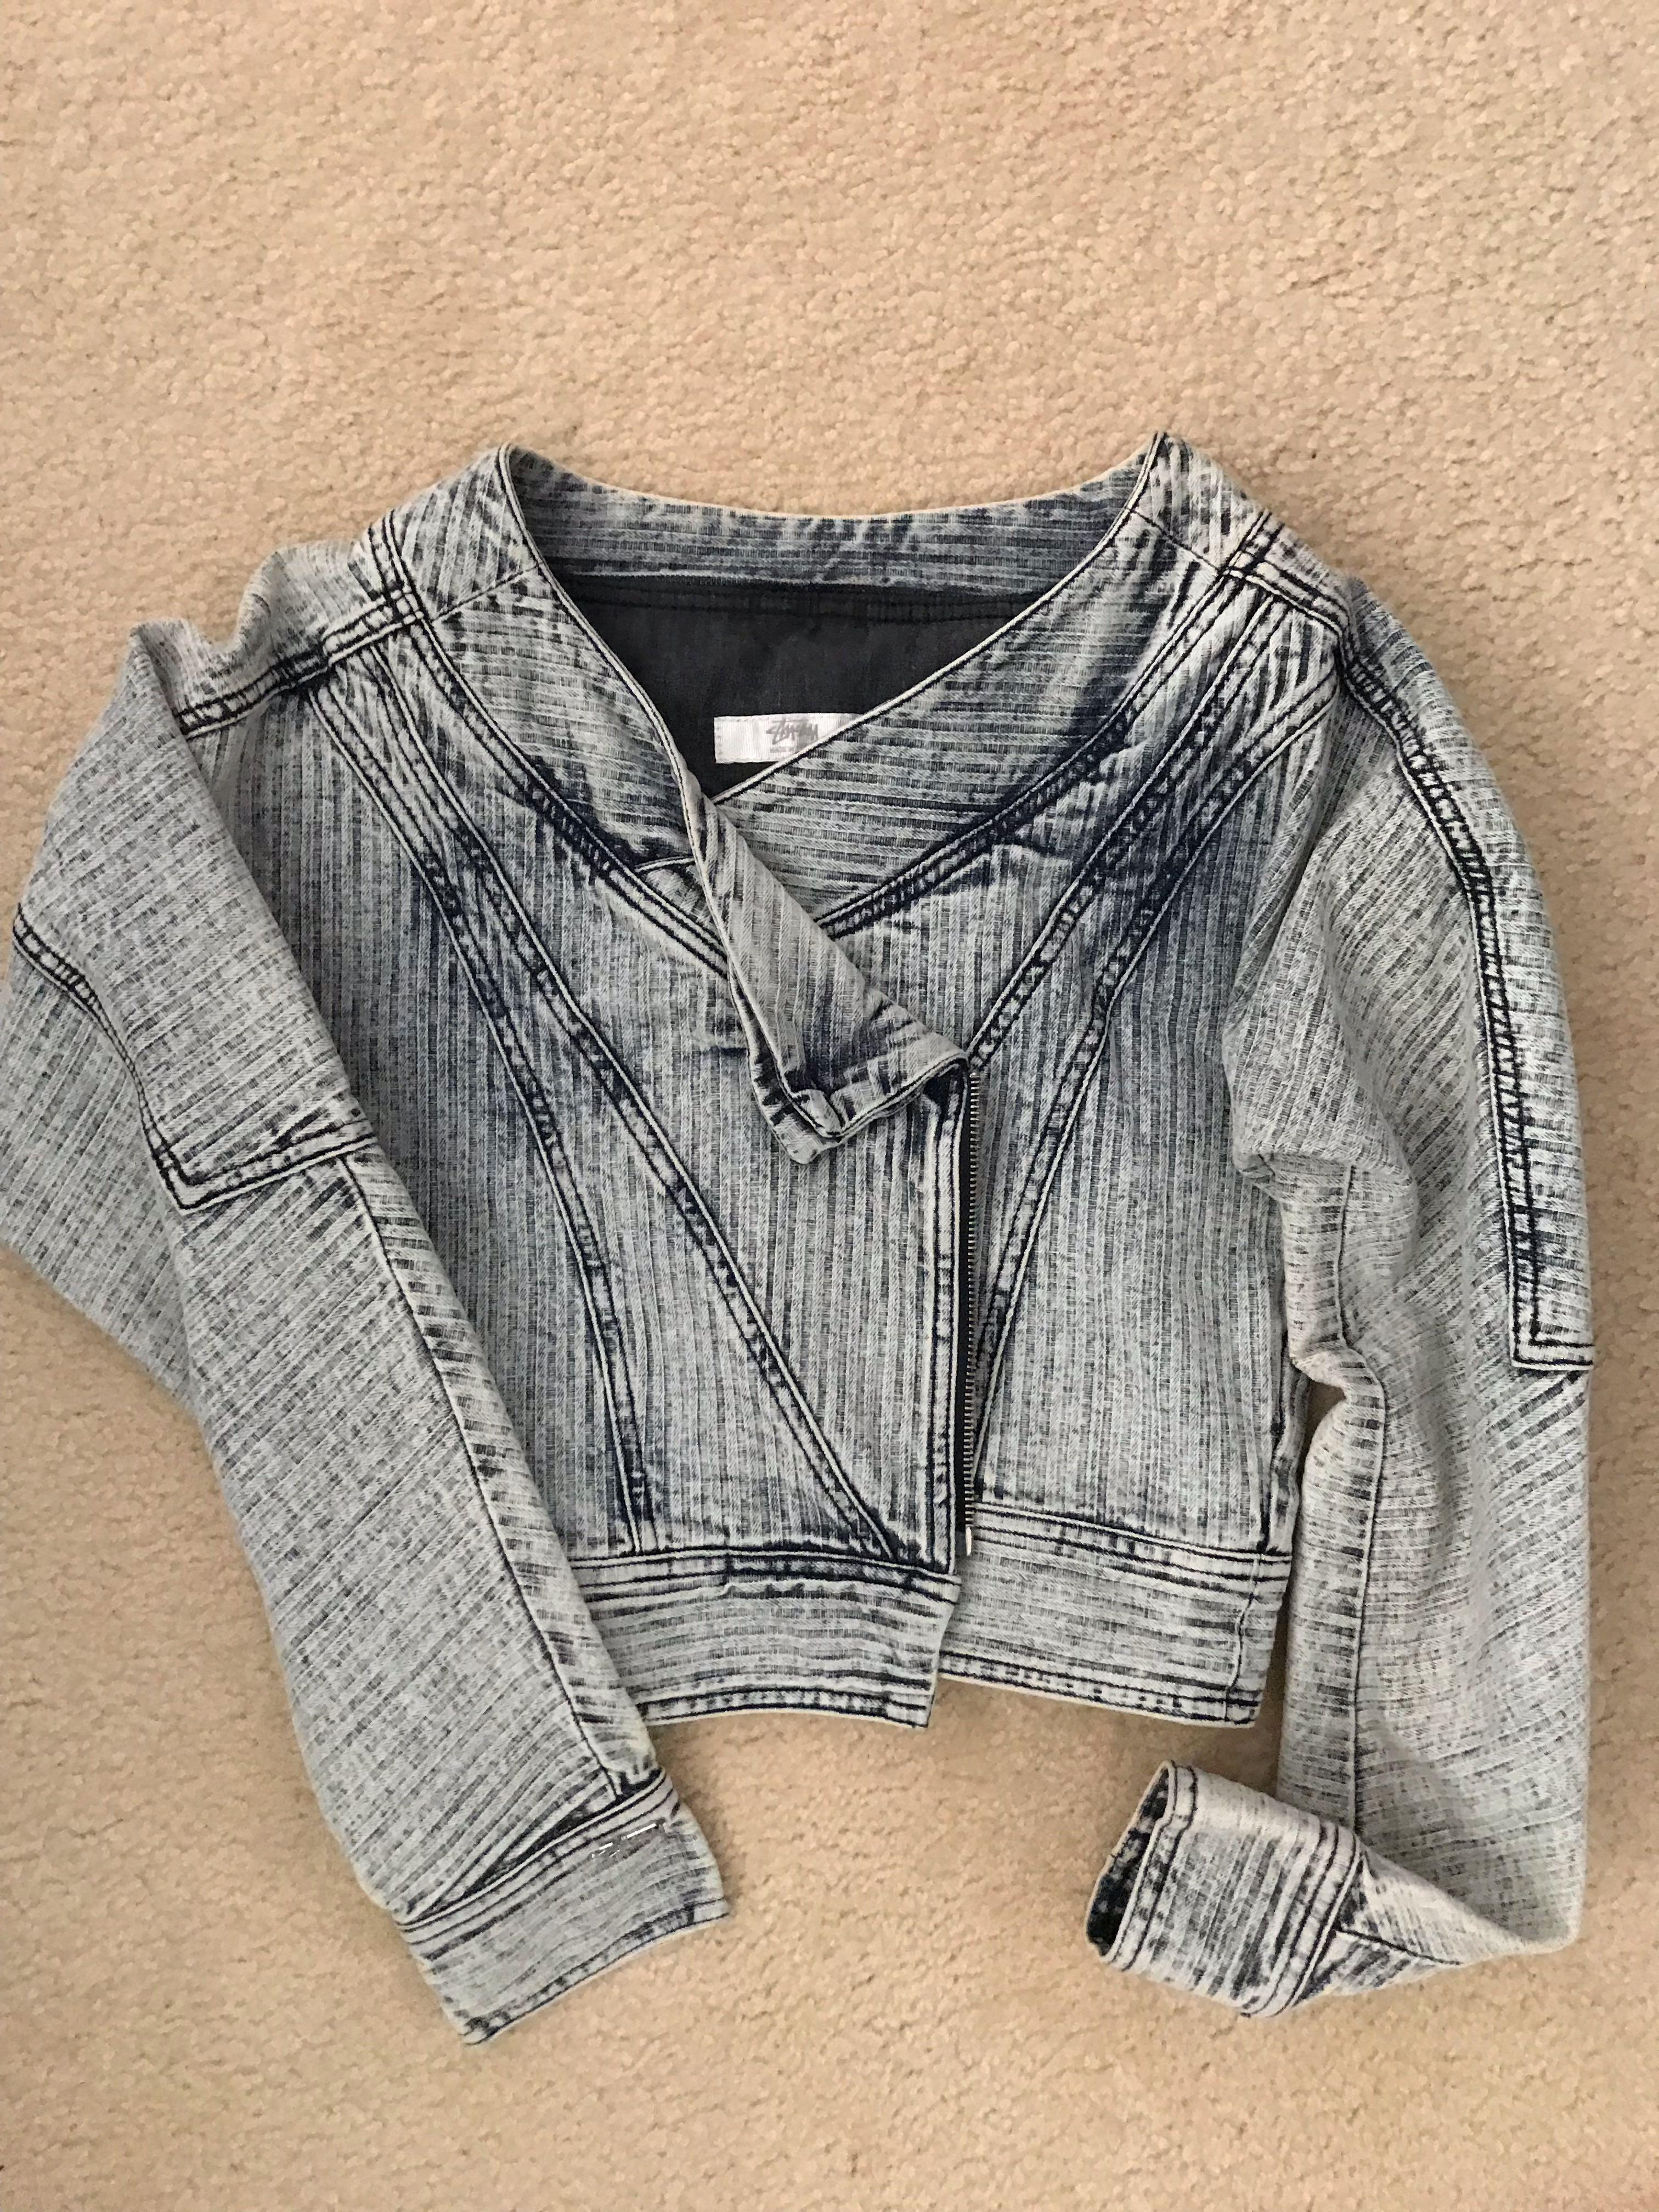 Stussy Cropped Denim Jacket